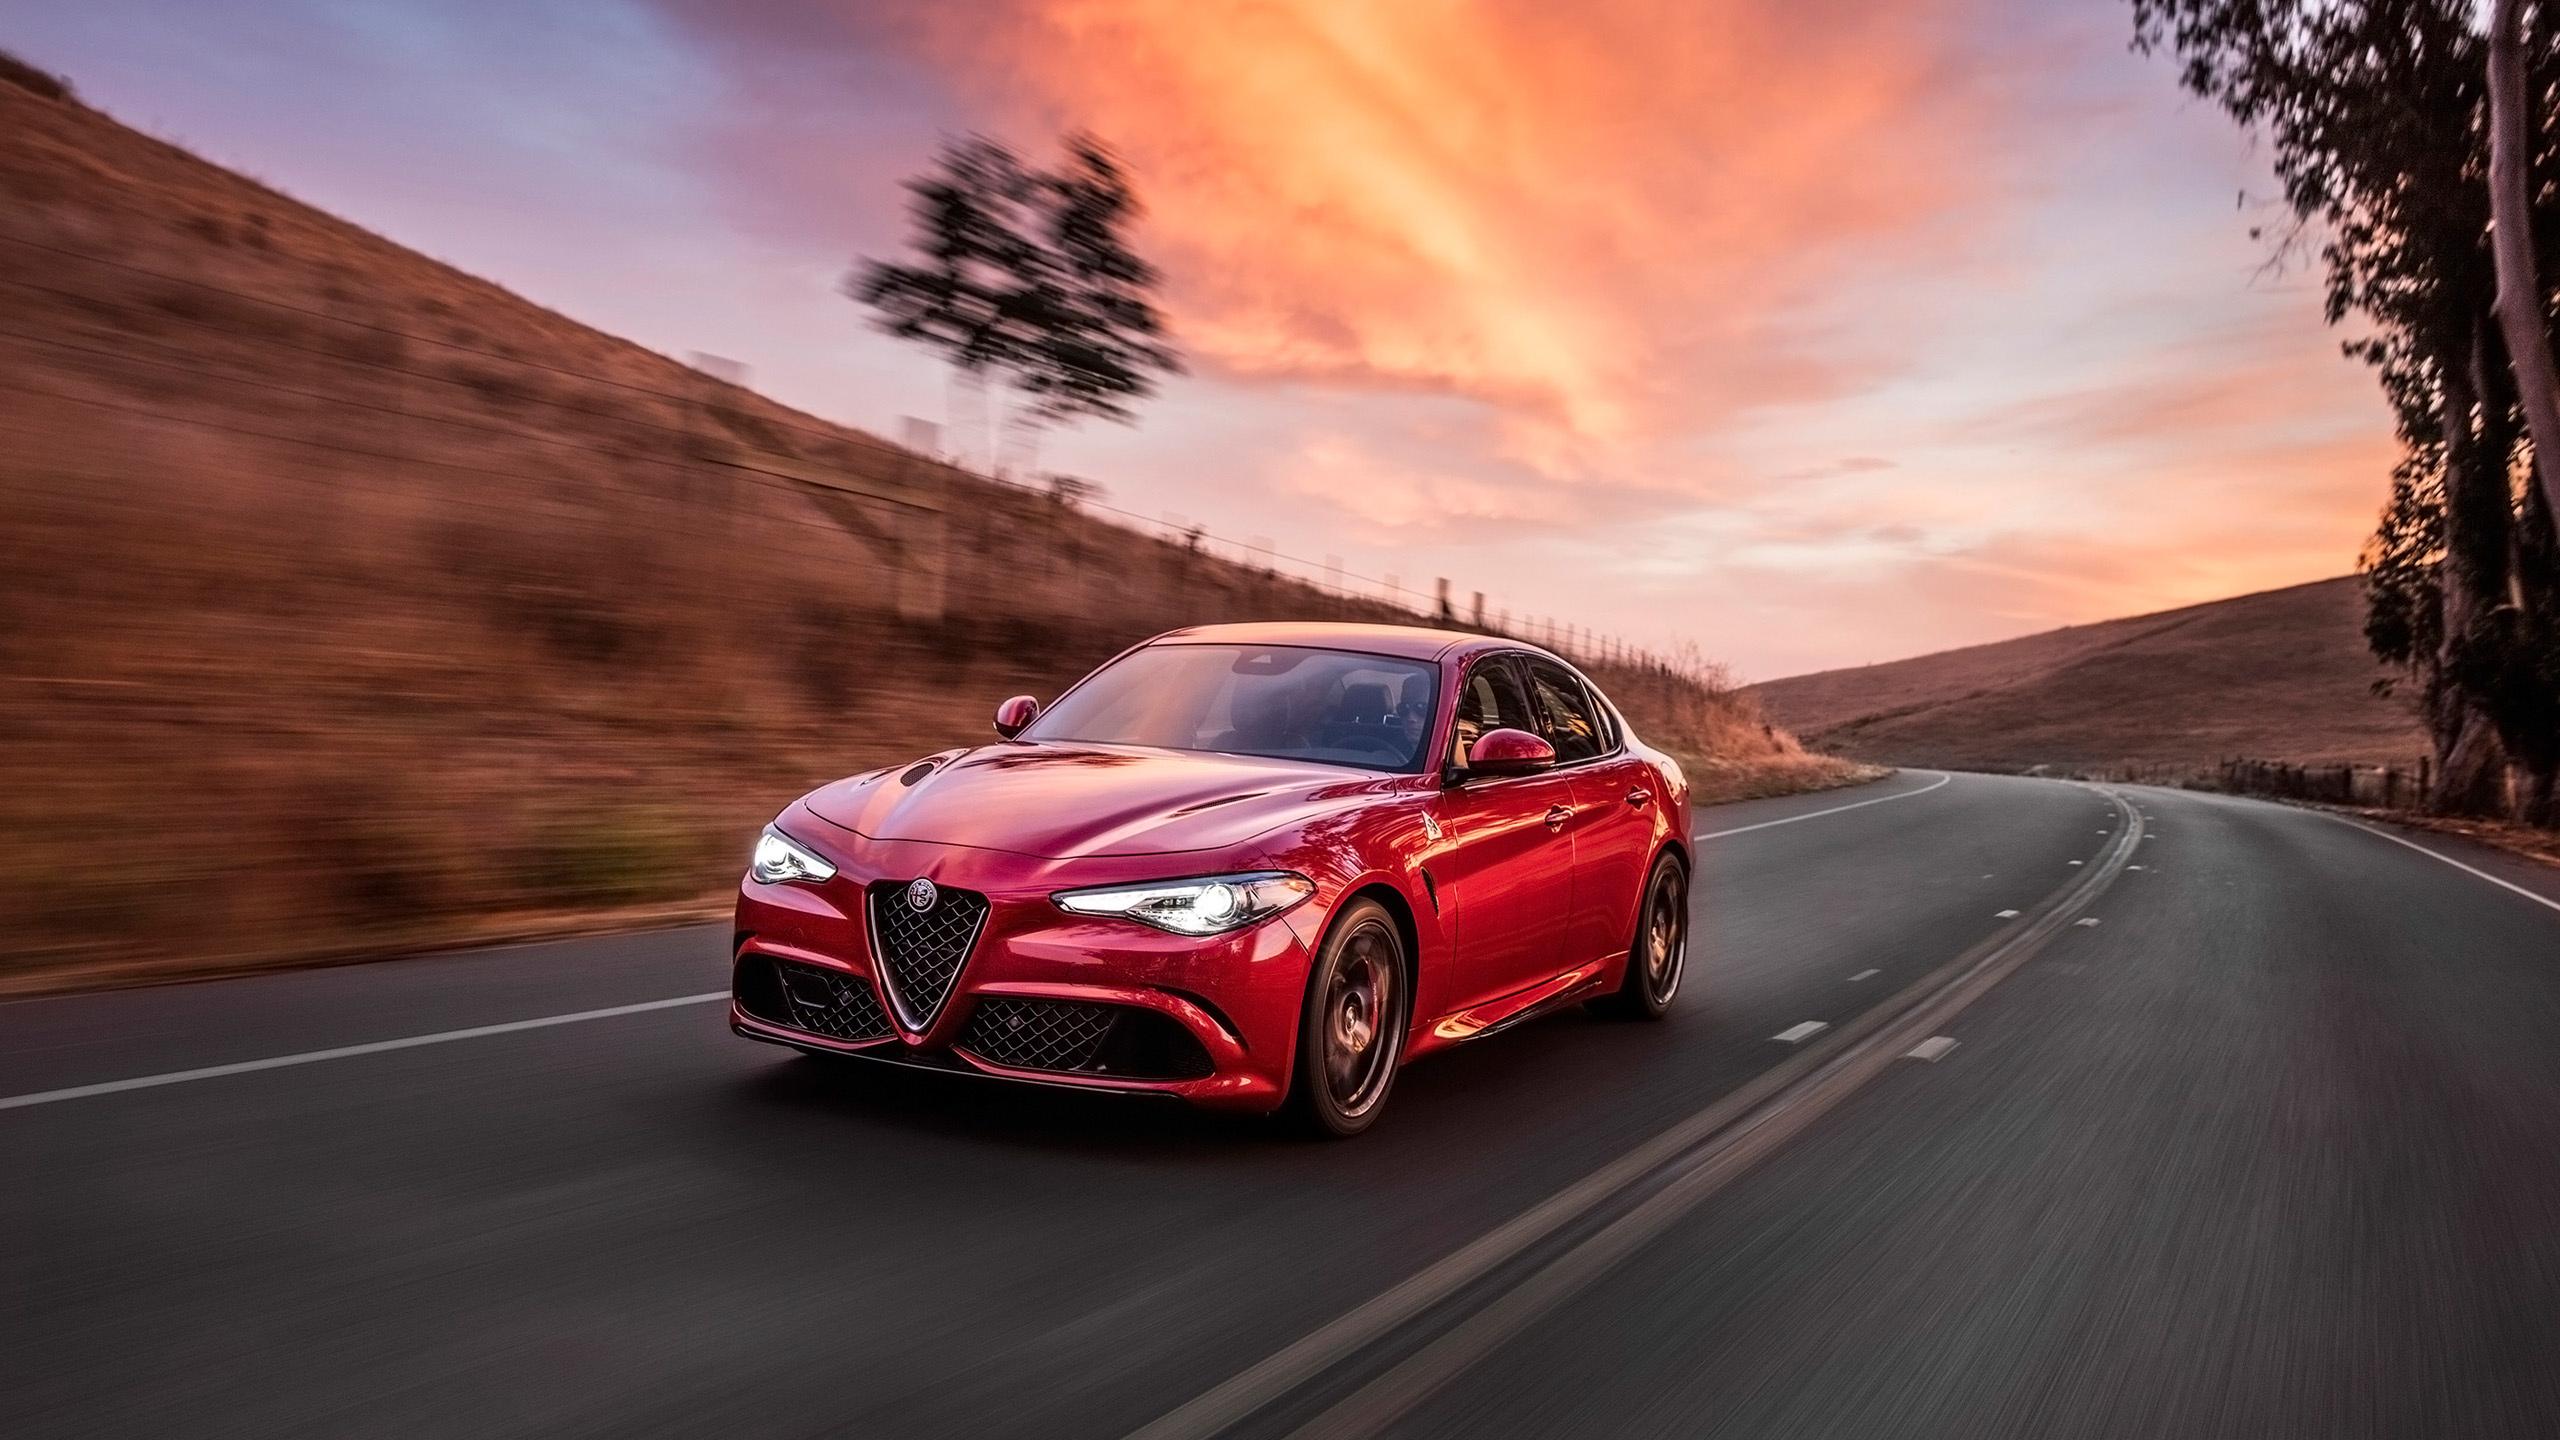 Alfa Romeo Wallpapers 2560x1440 58Z7T3S   4USkY 2560x1440